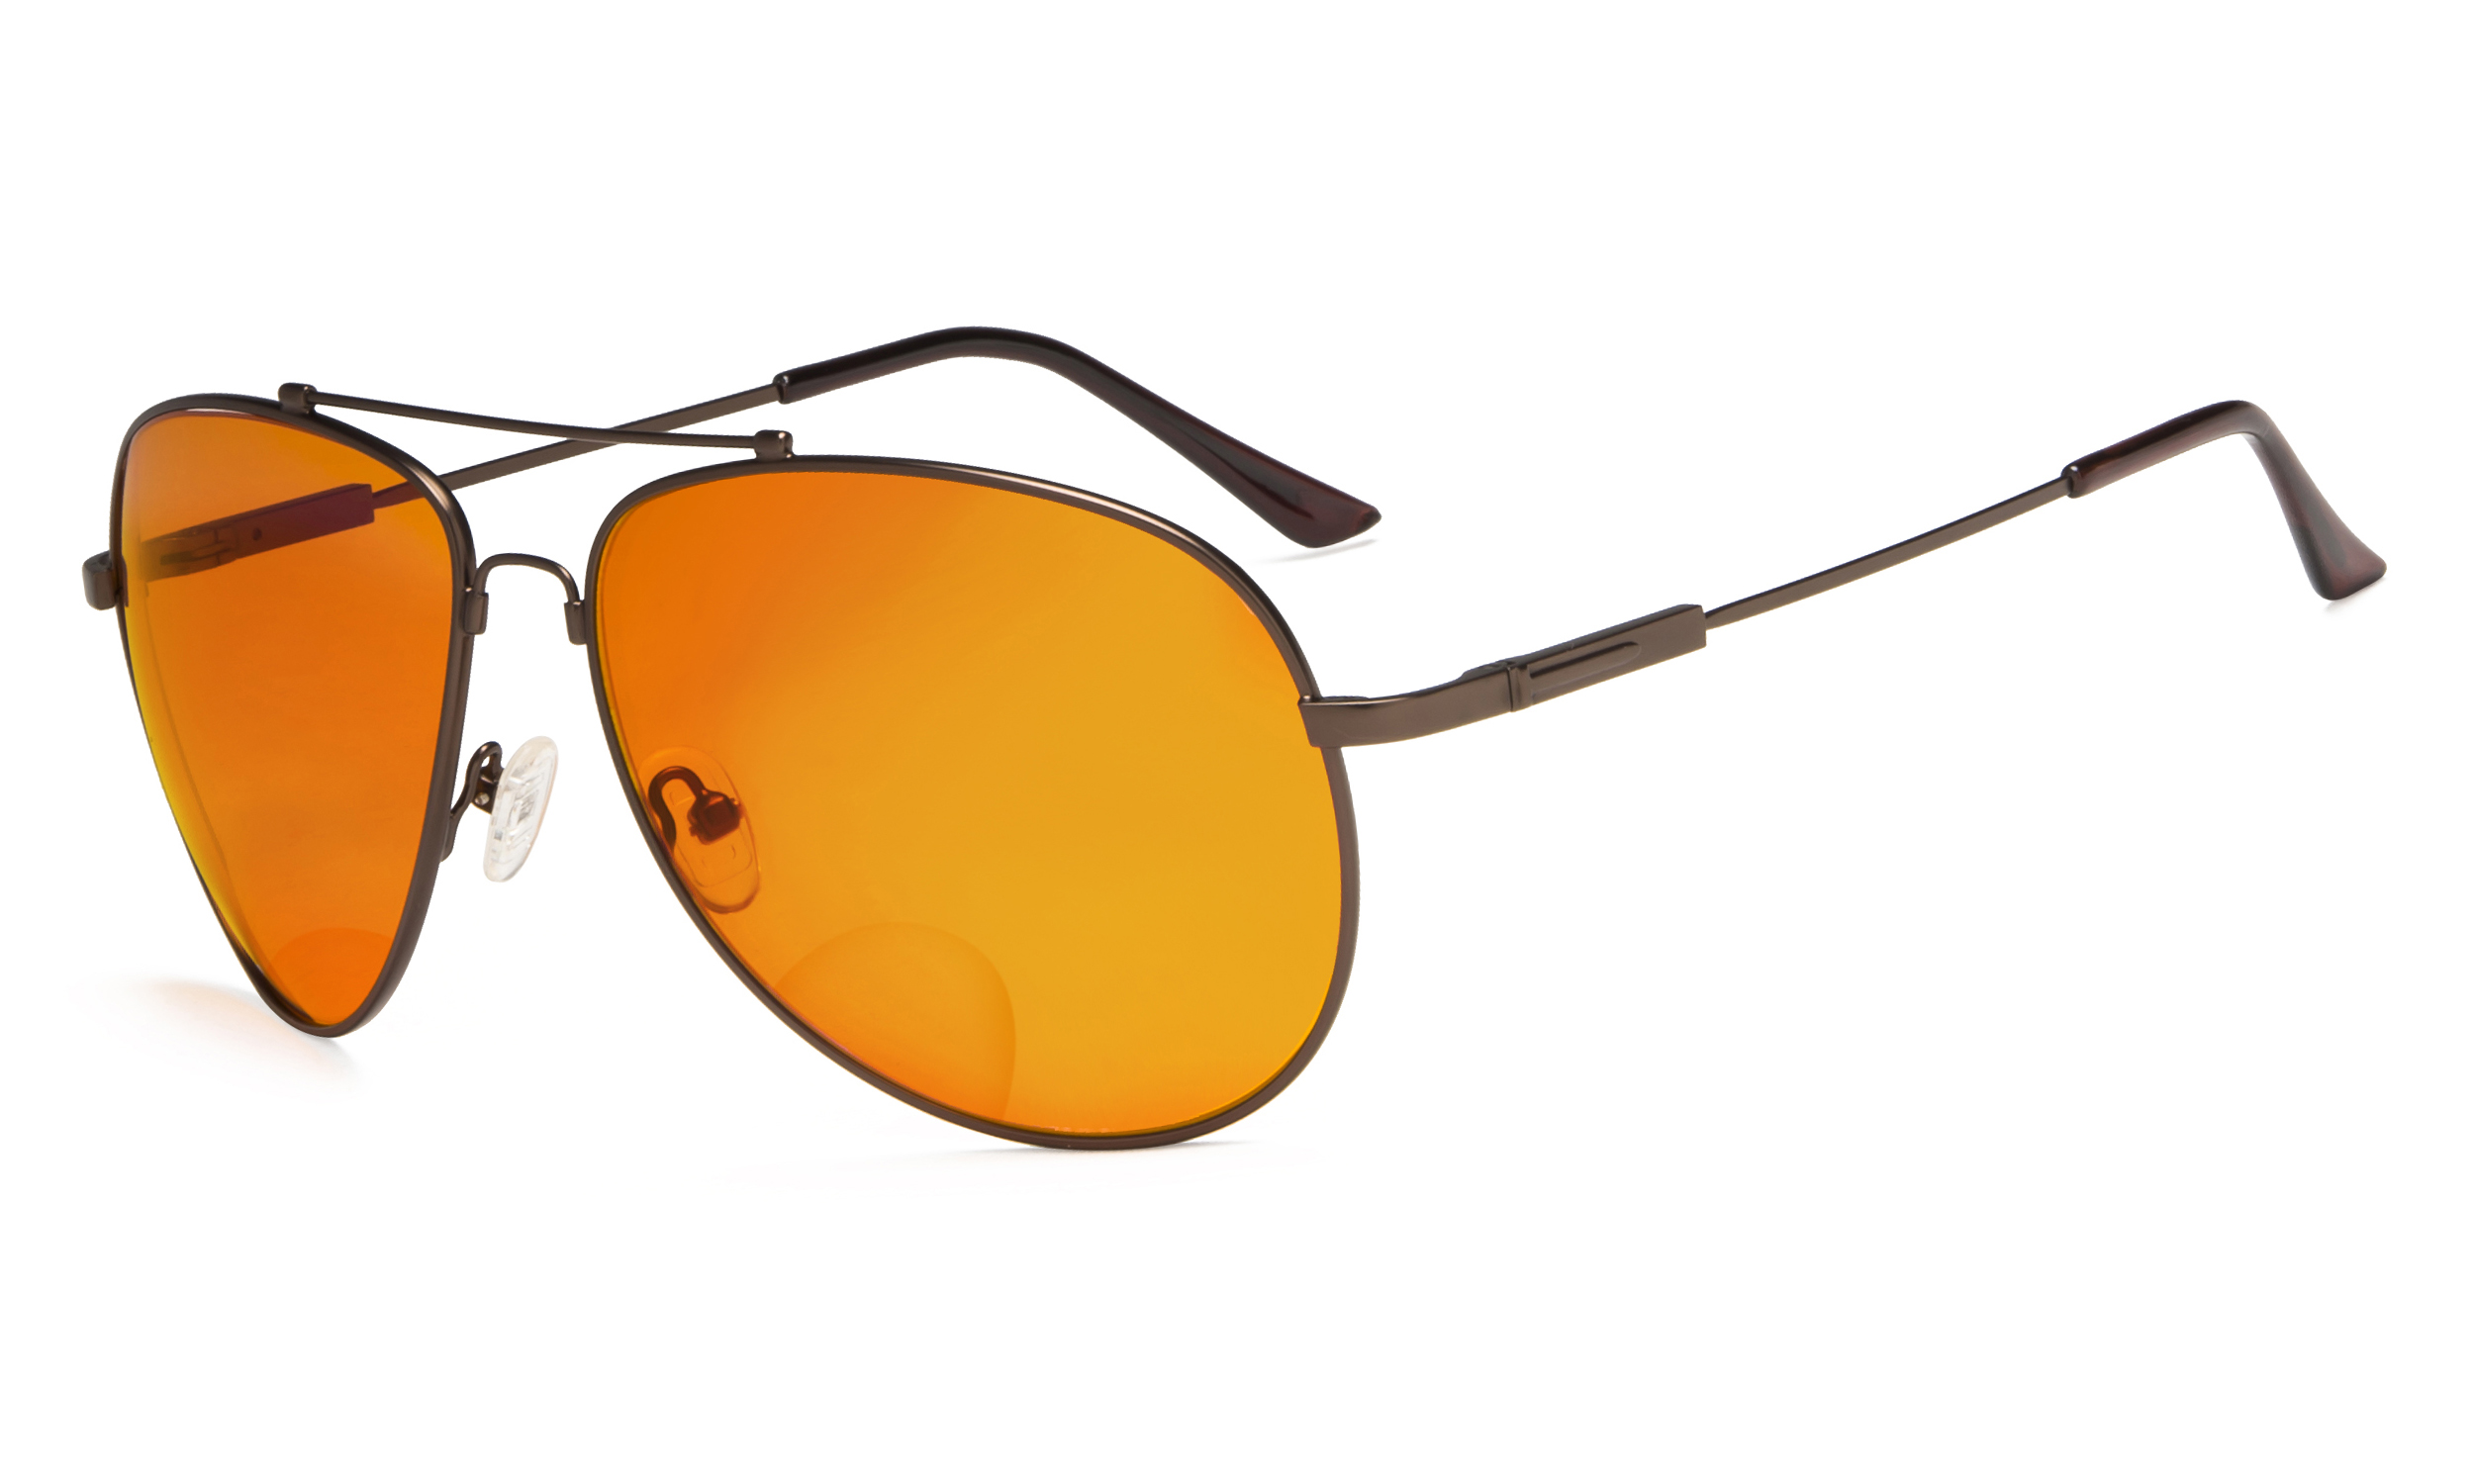 2529cdc99c70 Eyekepper Bifocal Reading Glasses Blue Blocking for Sleep-Nighttime Orange  Tinted Men Women Brown DSSG1802